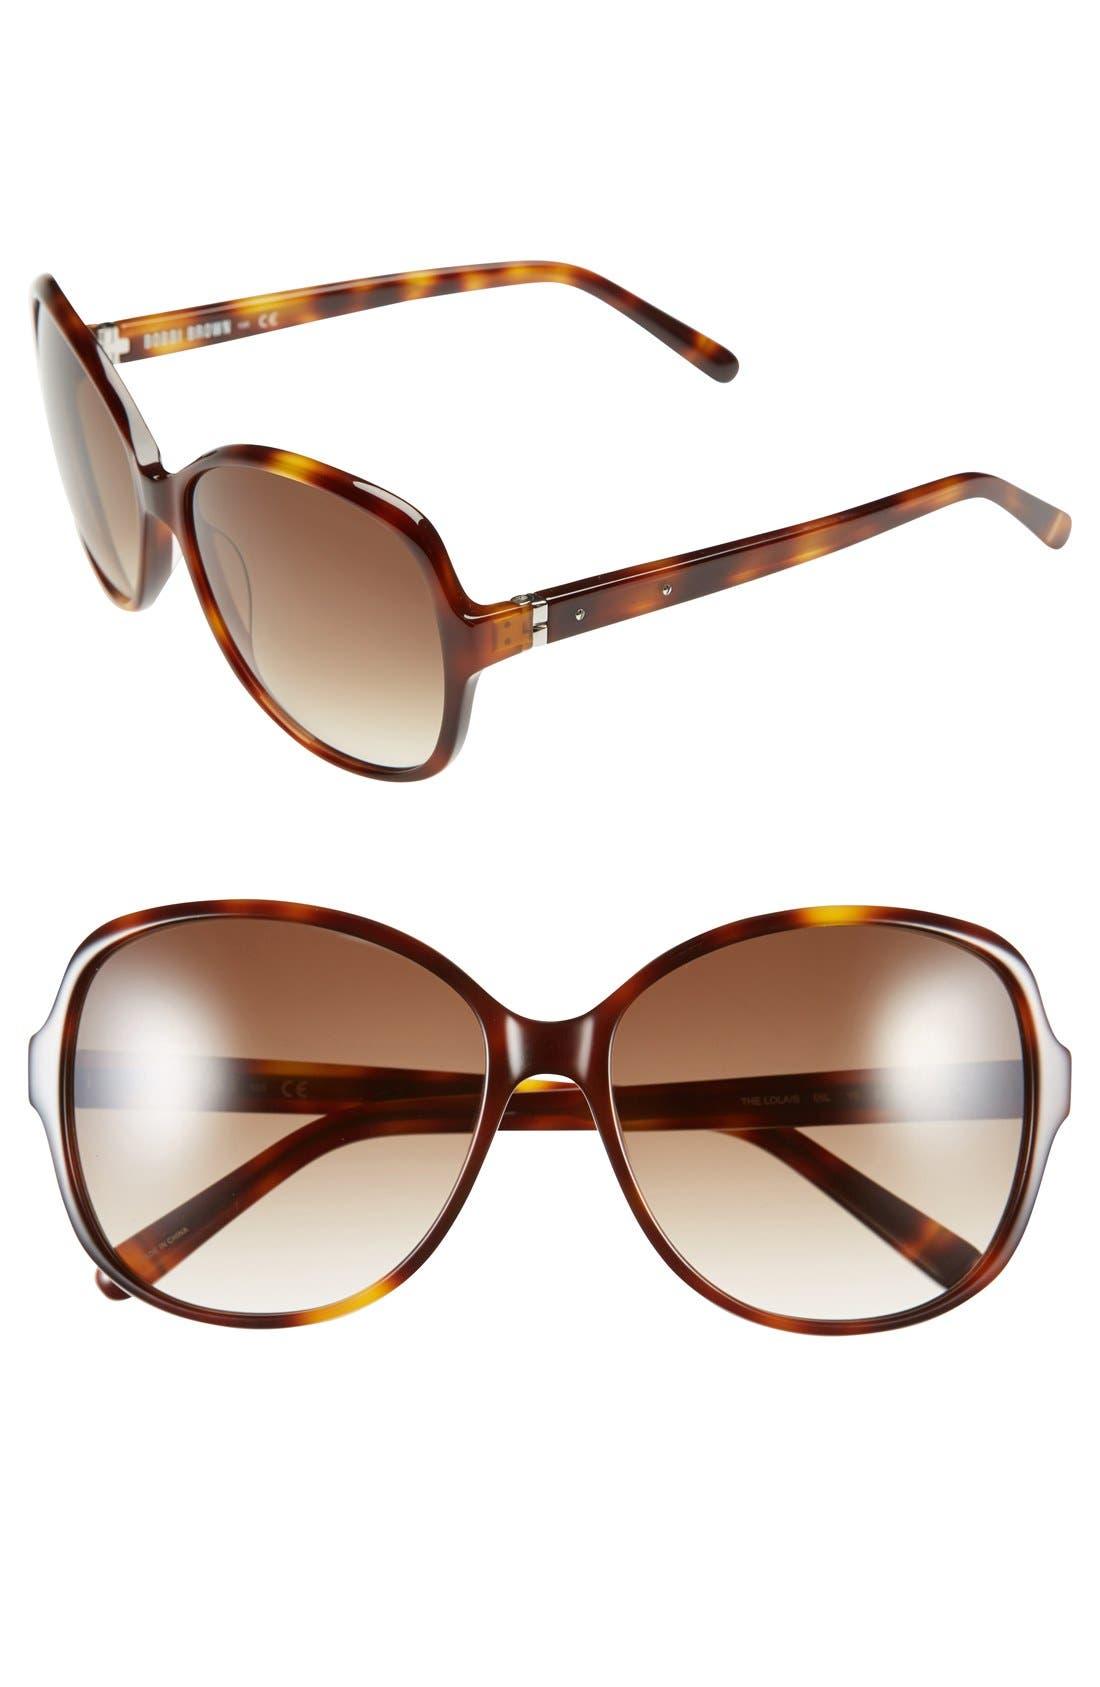 Main Image - Bobbi Brown 'The Lola' 59mm Sunglasses